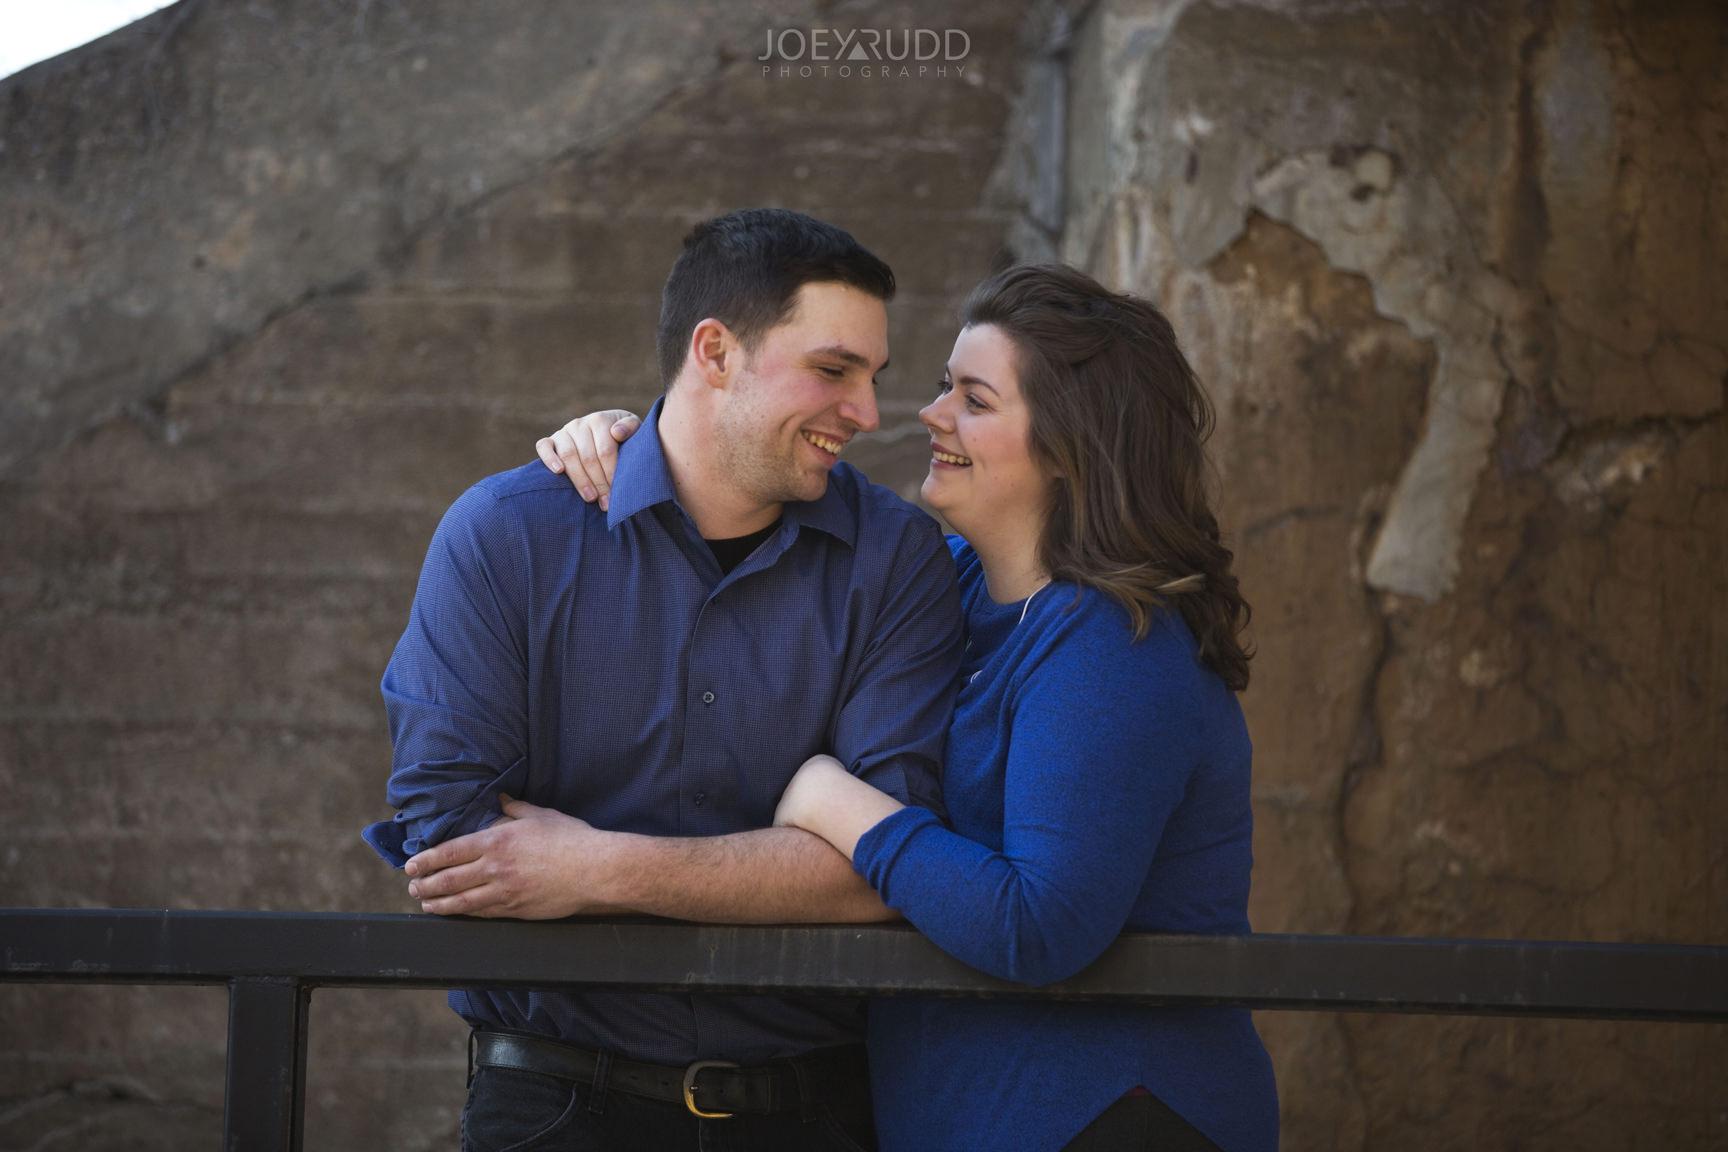 Almonte engagement photography by ottawa wedding photographer joey rudd photography couple